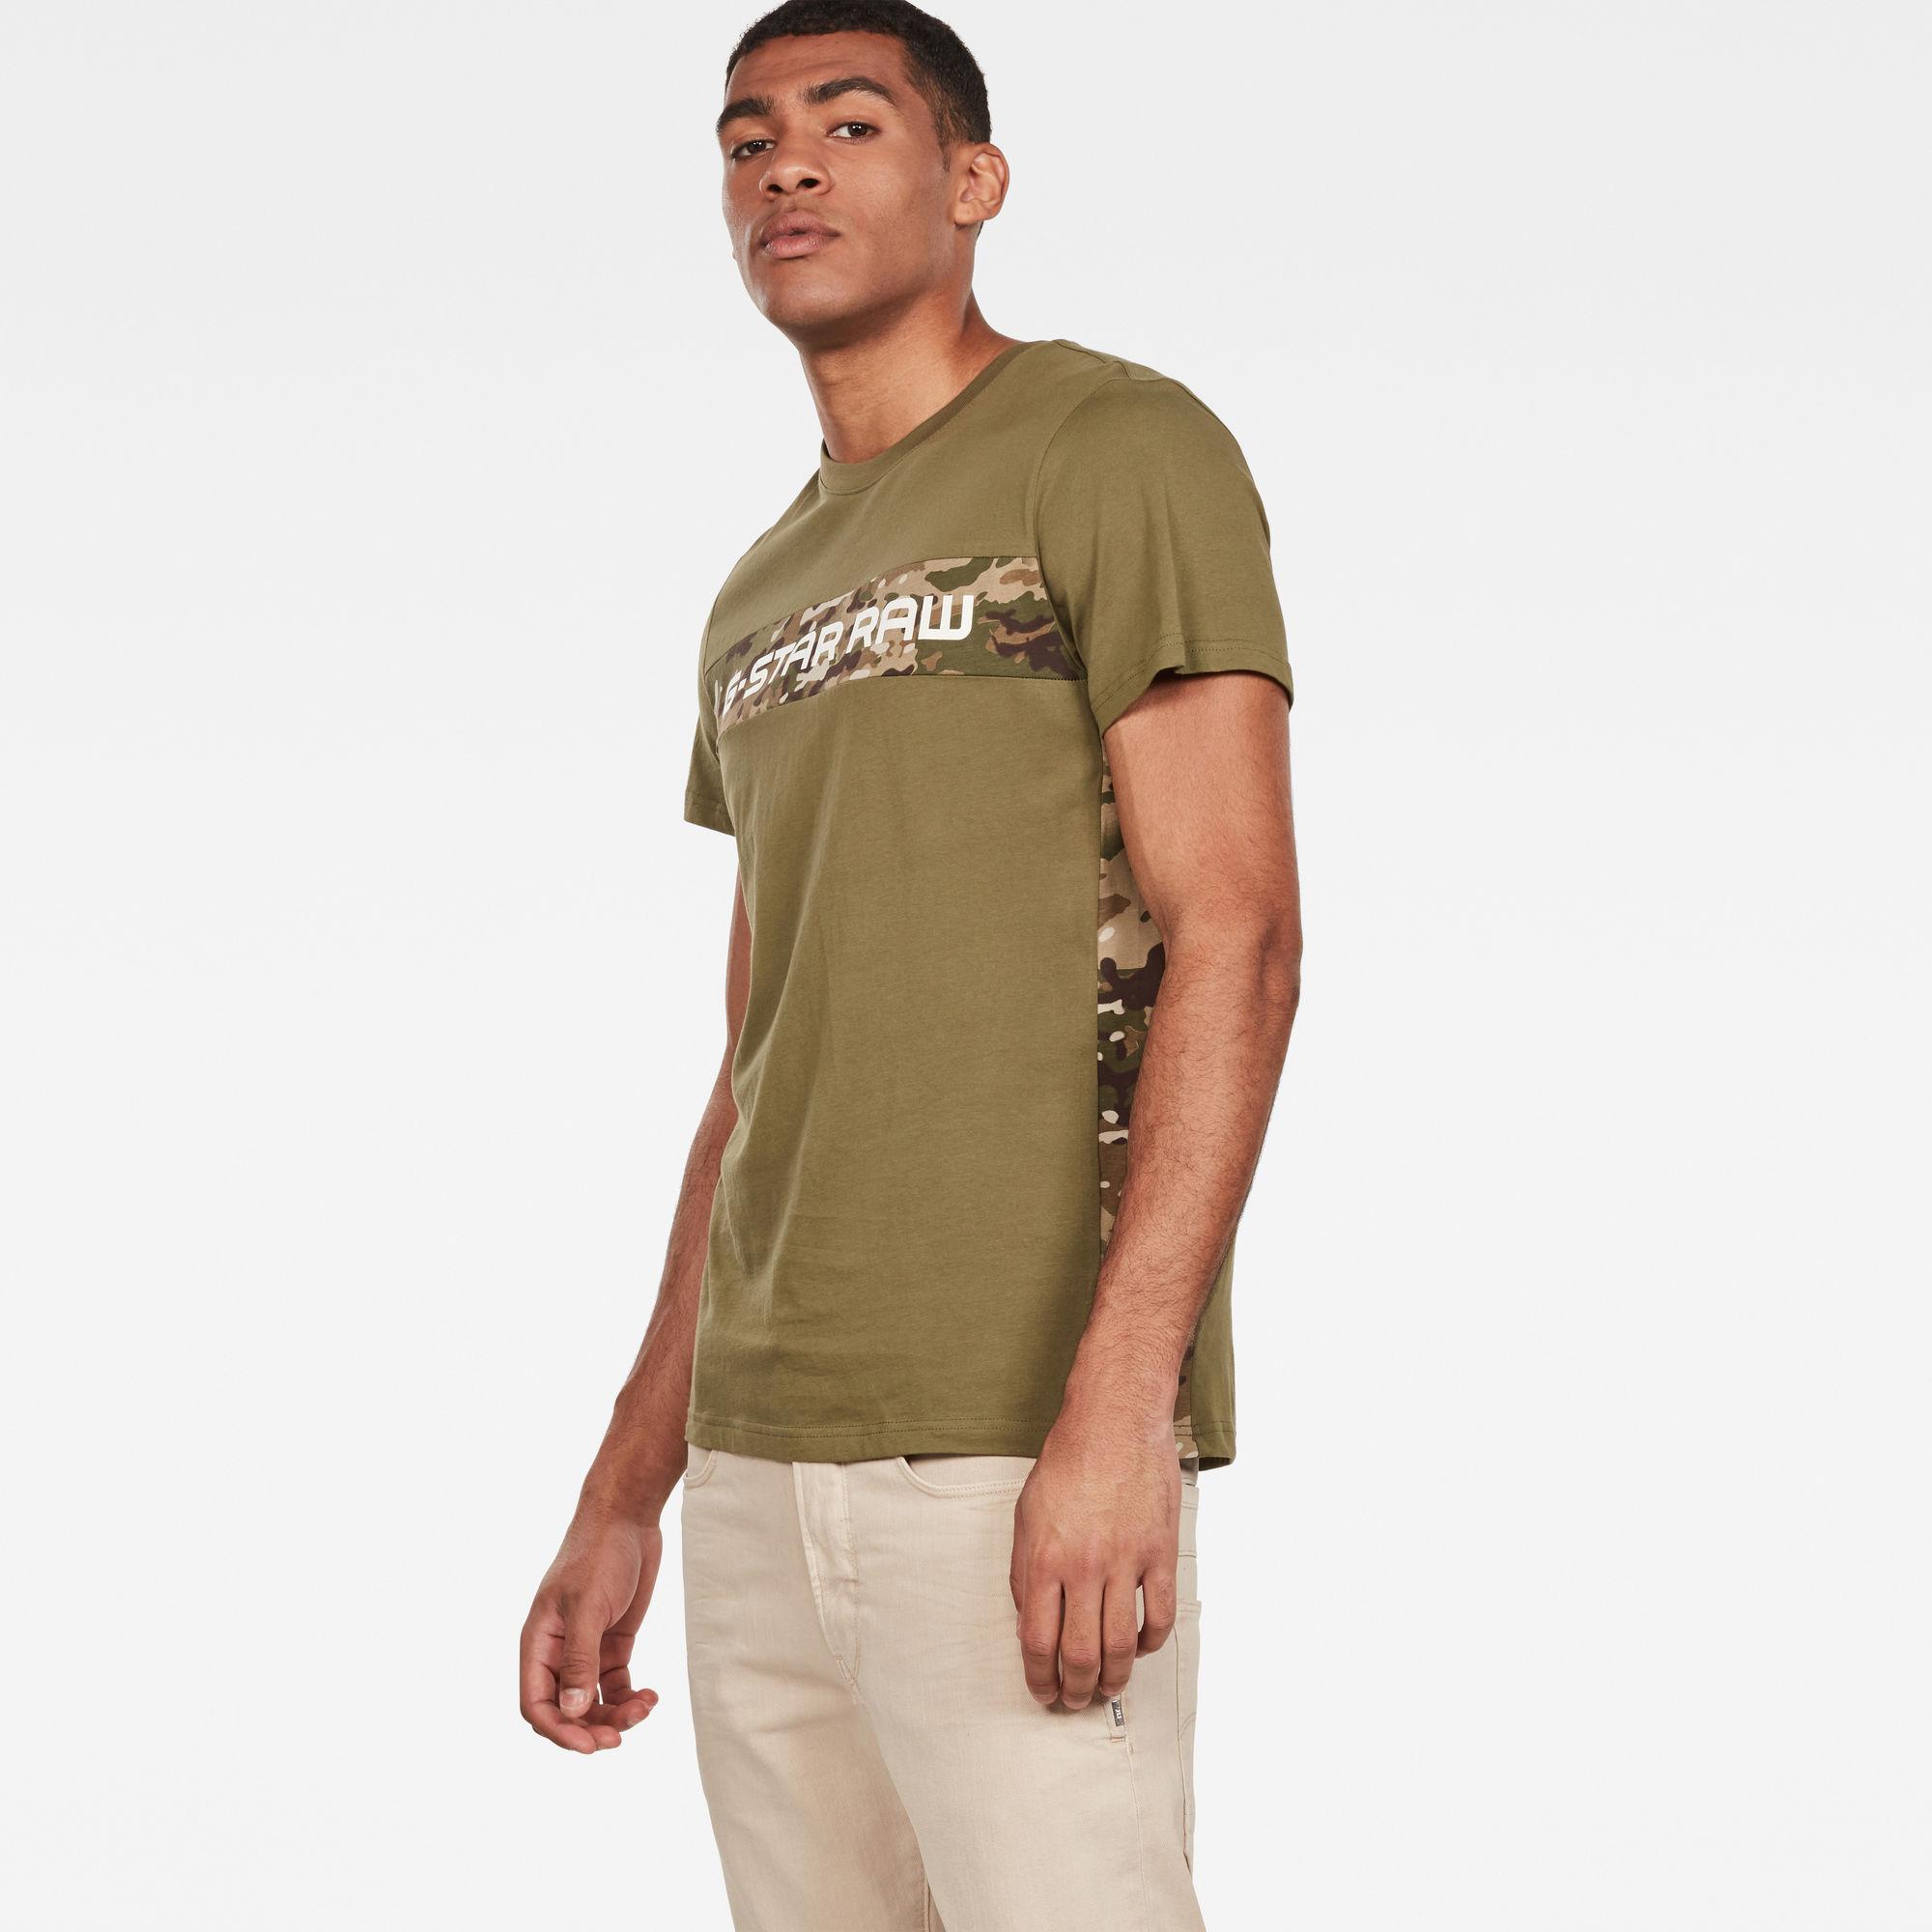 G-Star RAW Graphic 7 T-shirt